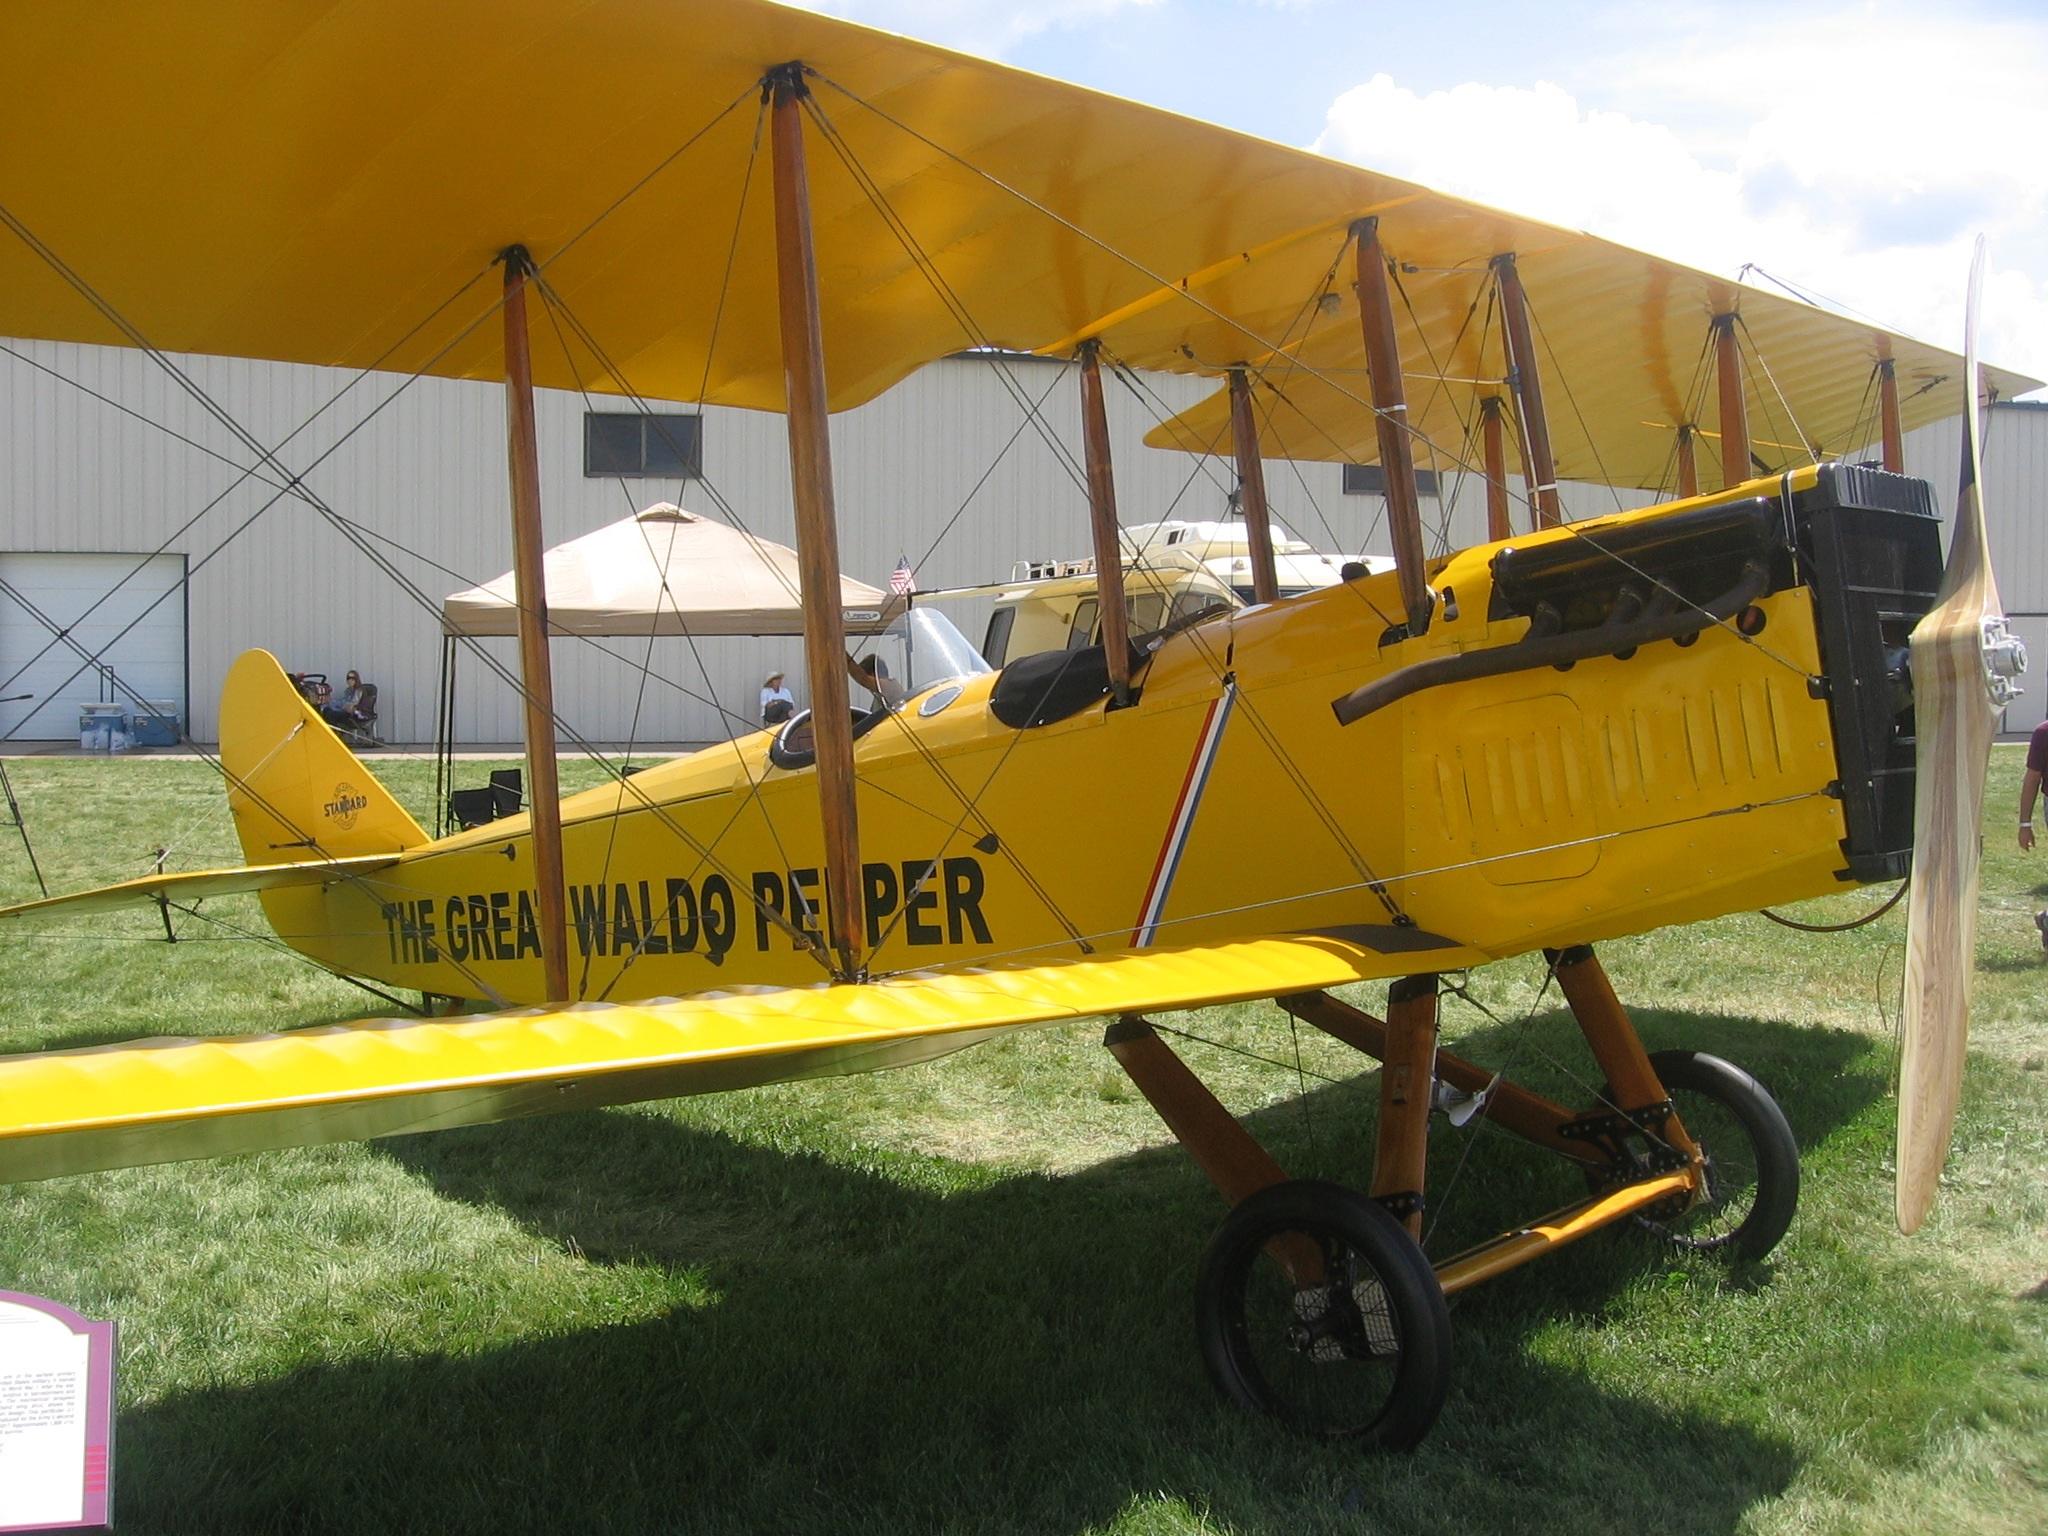 Free Images : airplane, vehicle, aviation, biplane, light aircraft